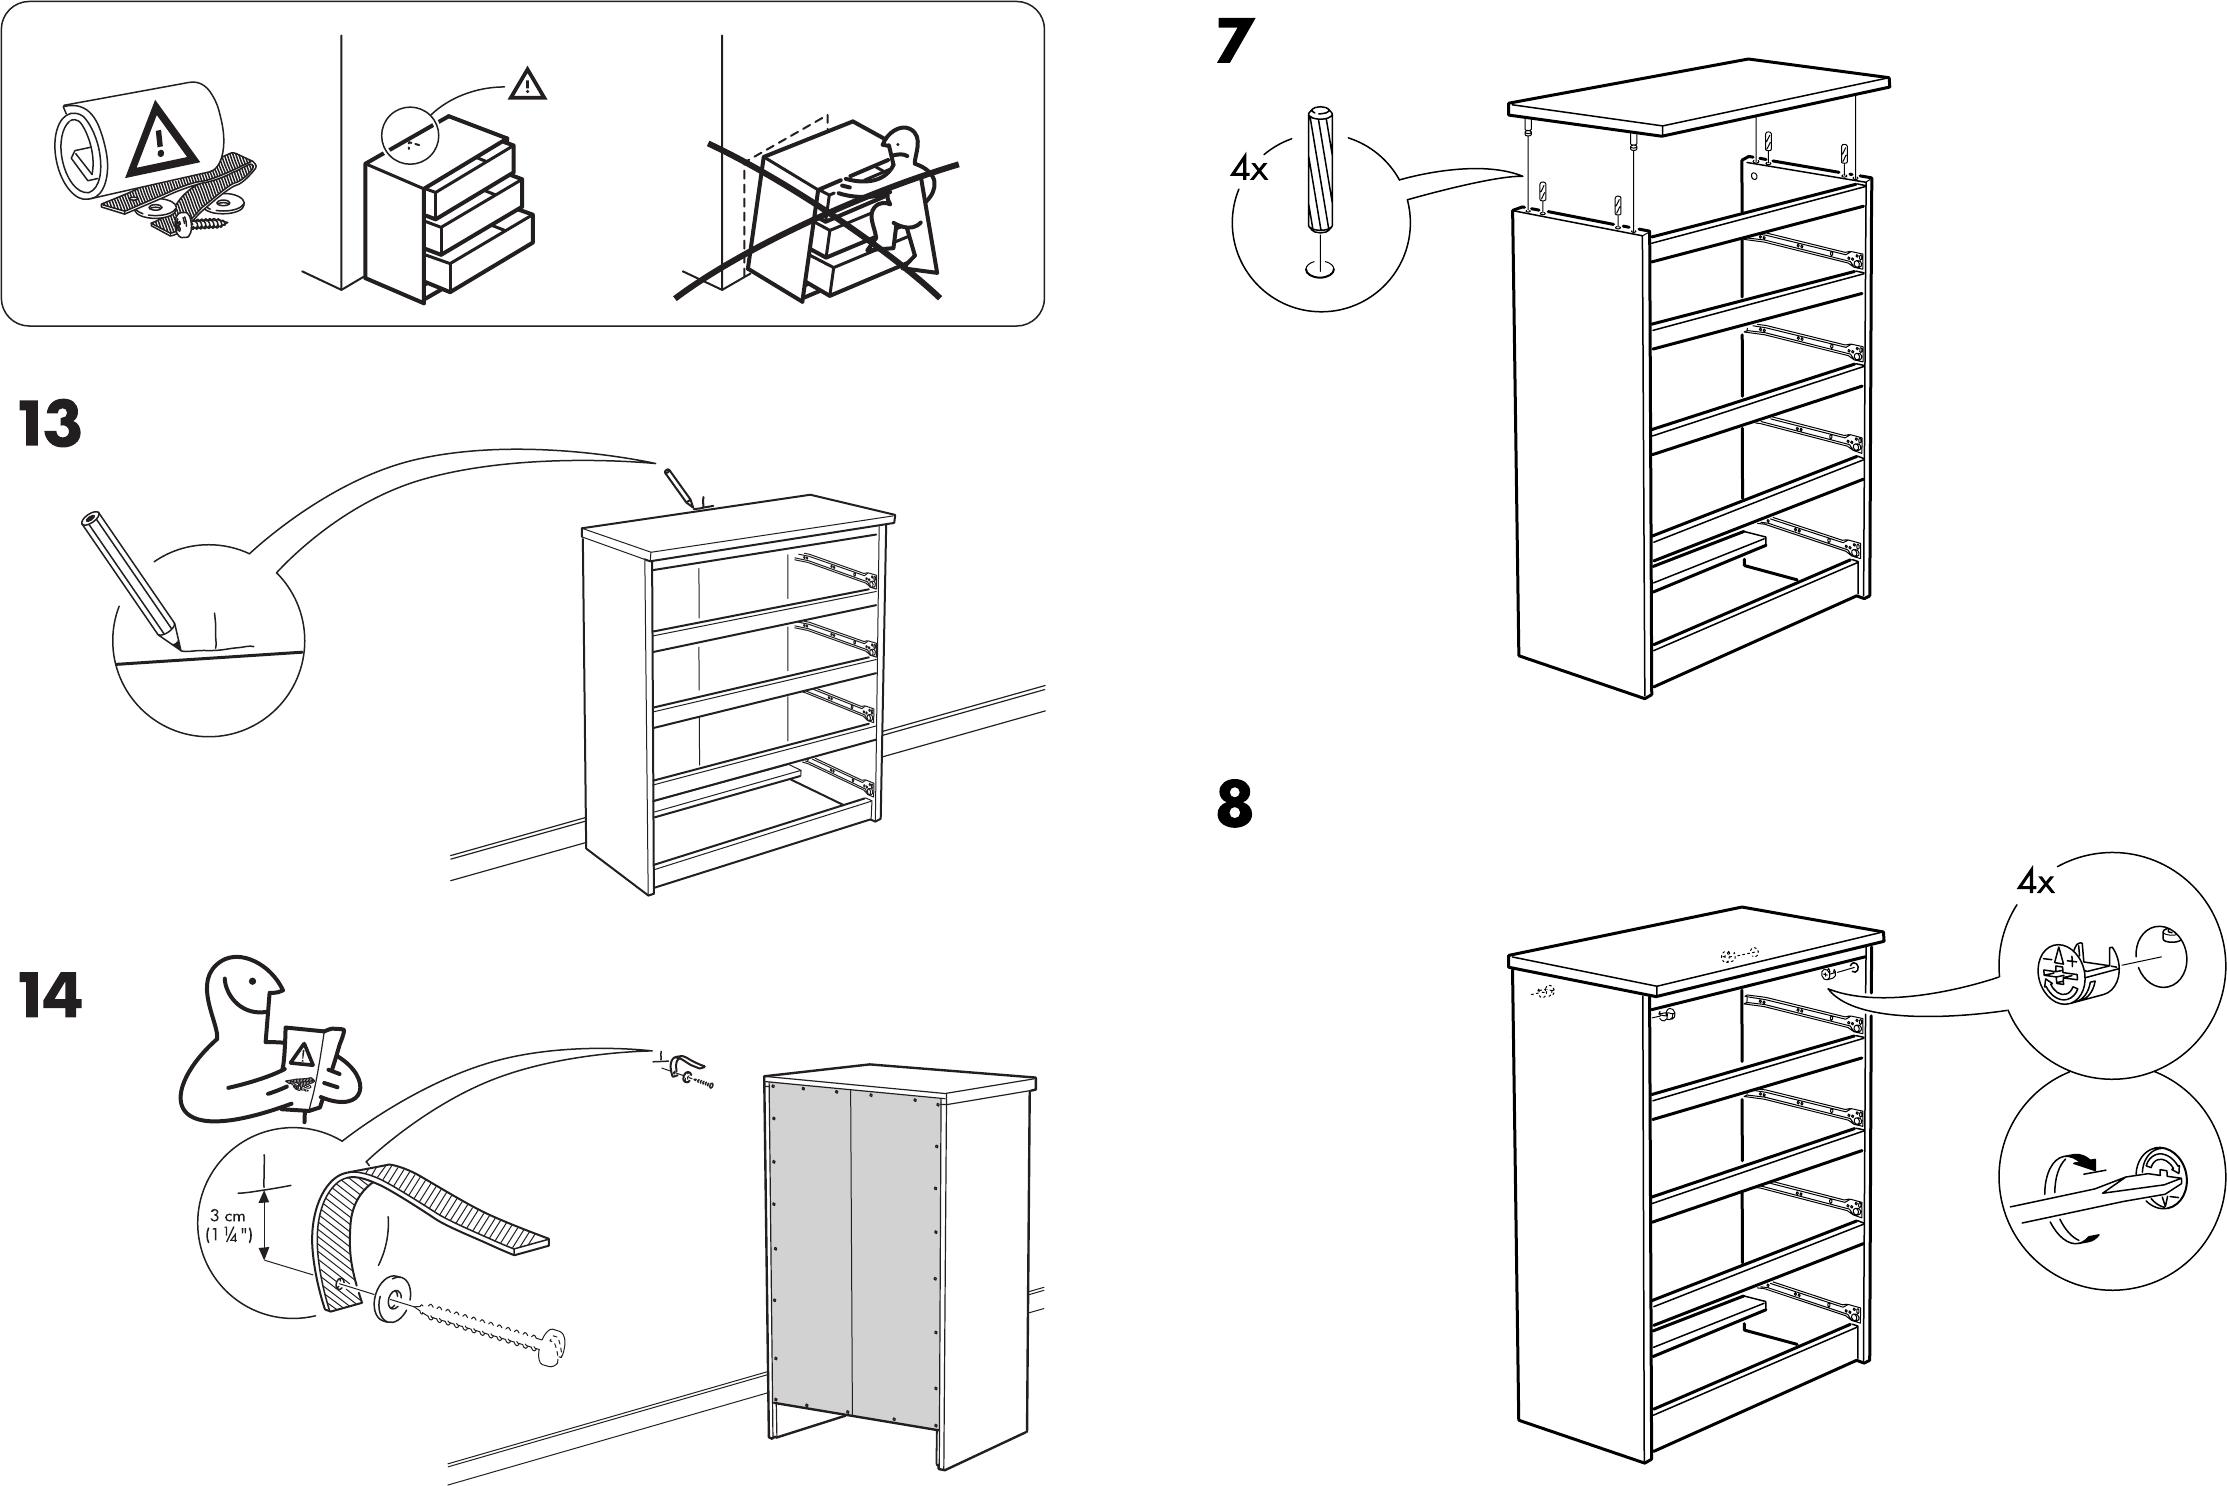 Ikea Malm Ladekast Handleiding.Handleiding Ikea Malm Ladekast 4 Pagina 7 Van 8 Dansk